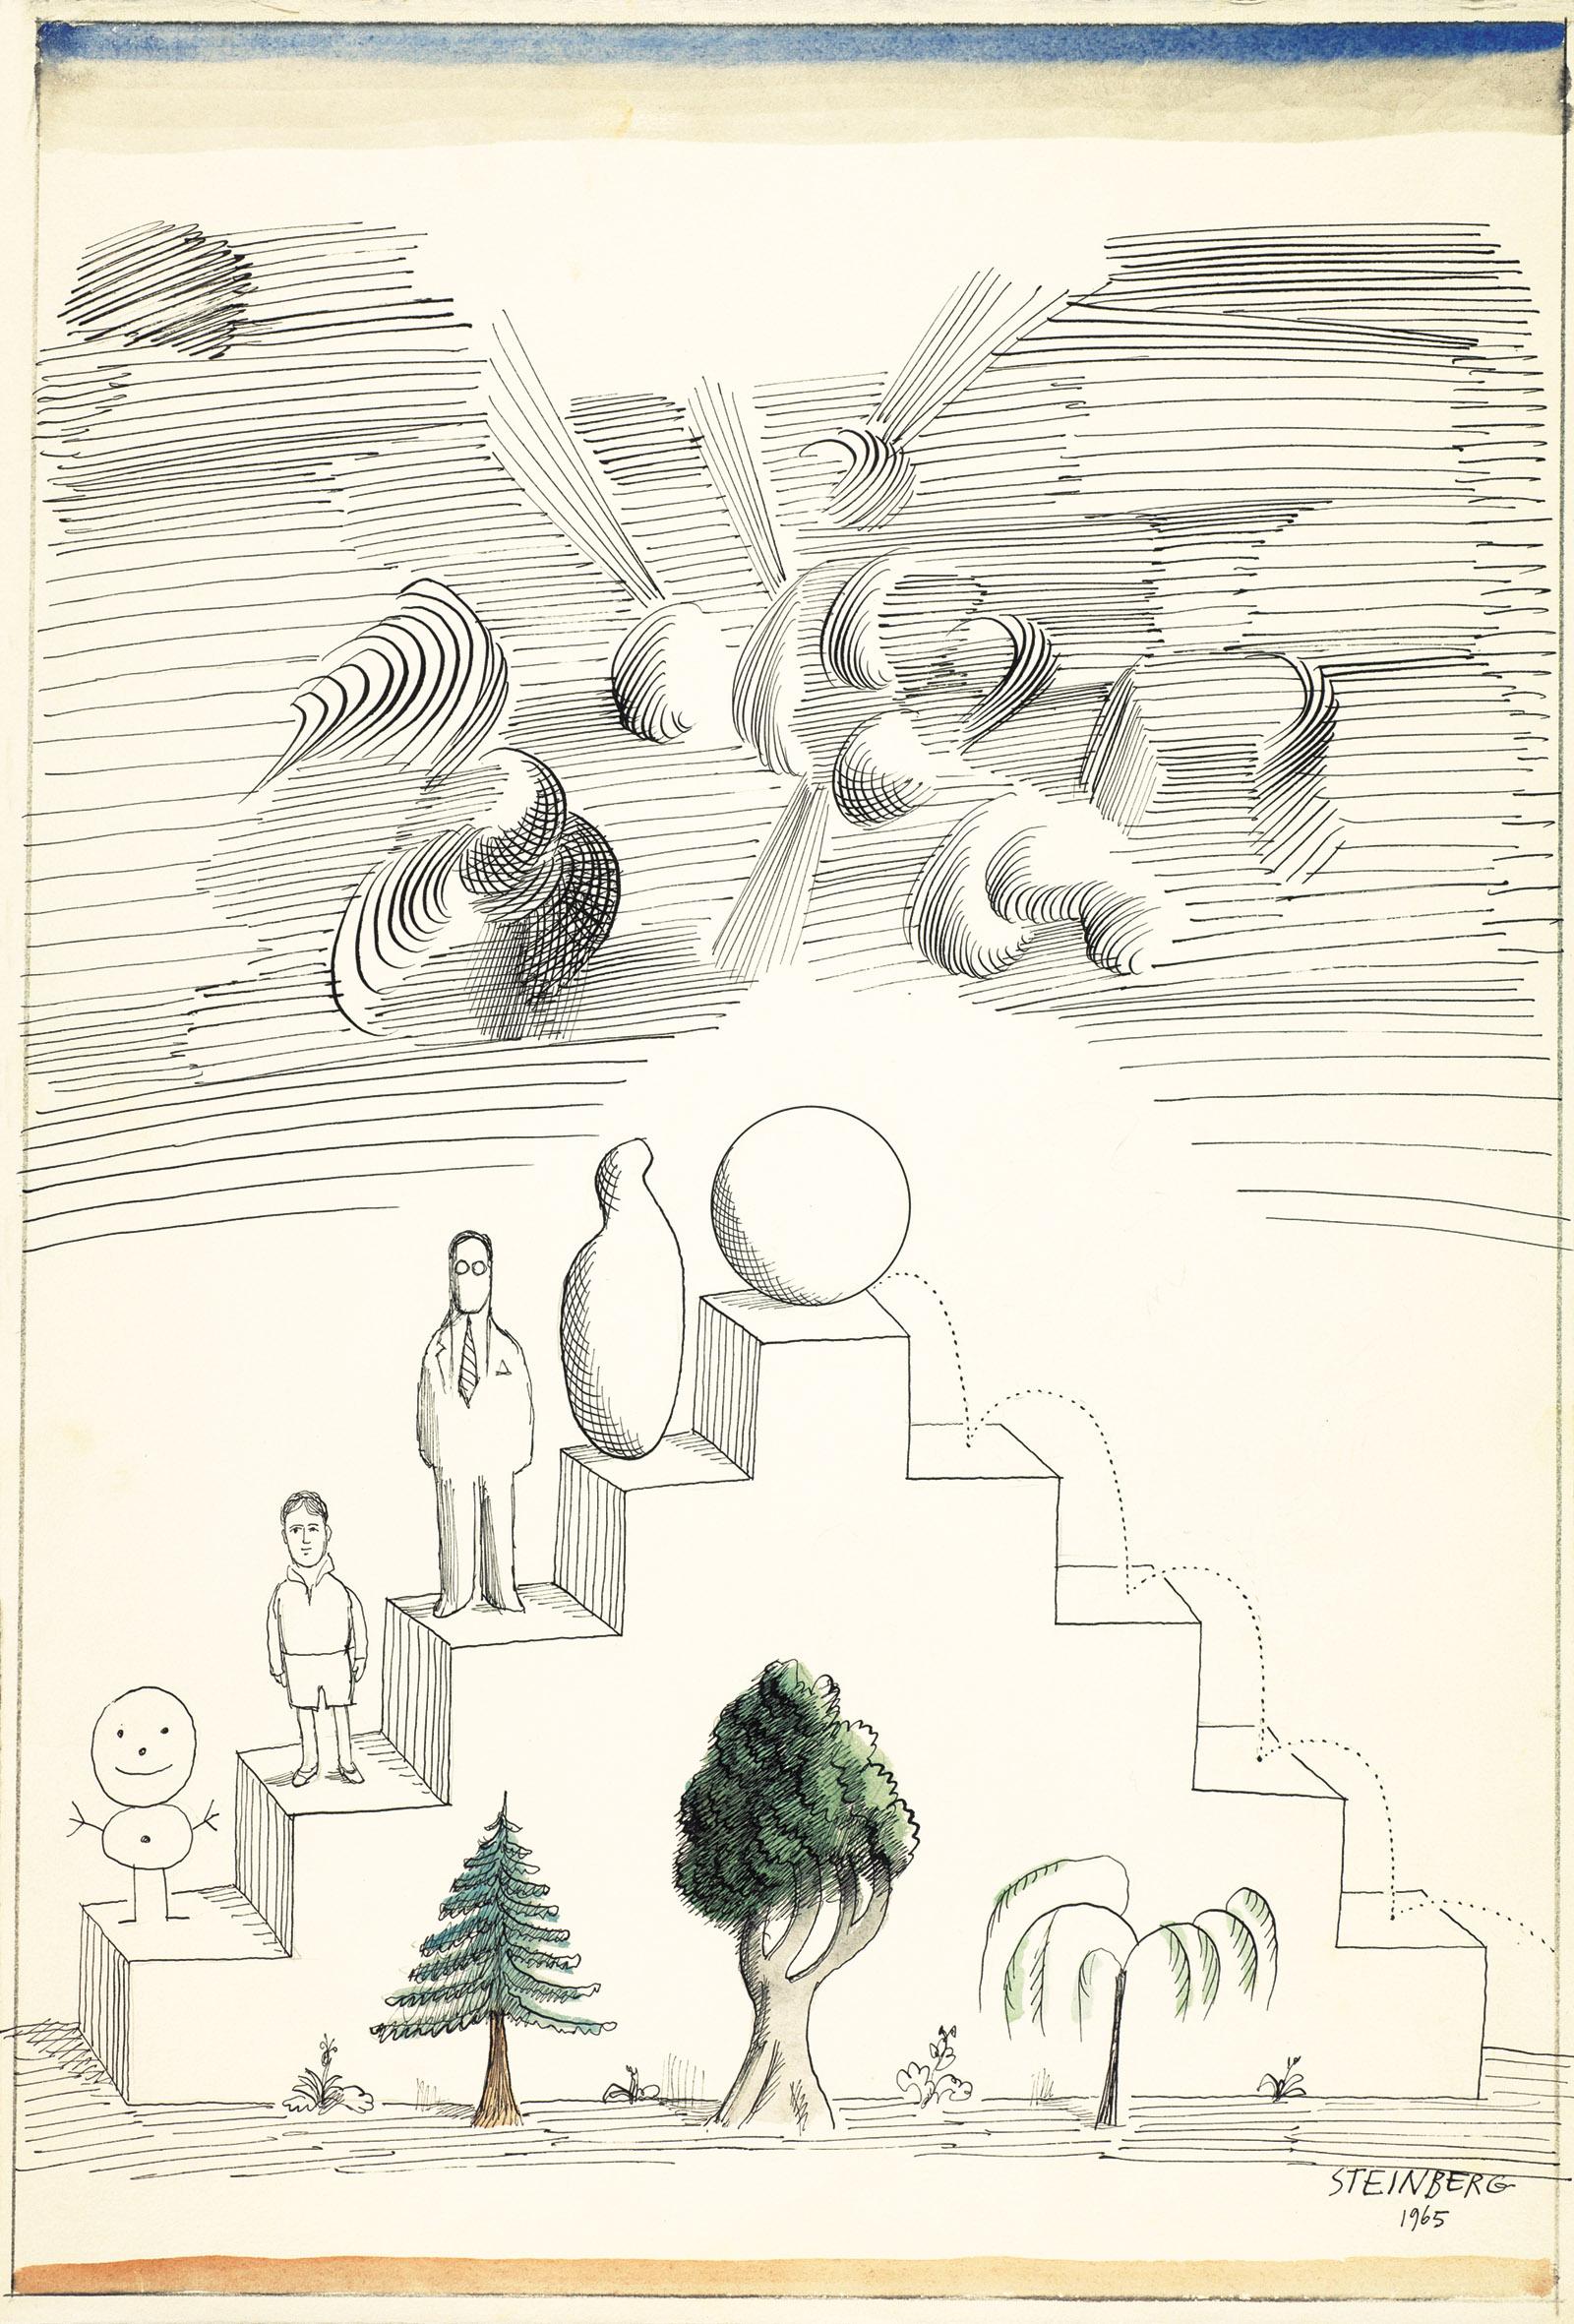 Saul Steinberg: Biography, 1965